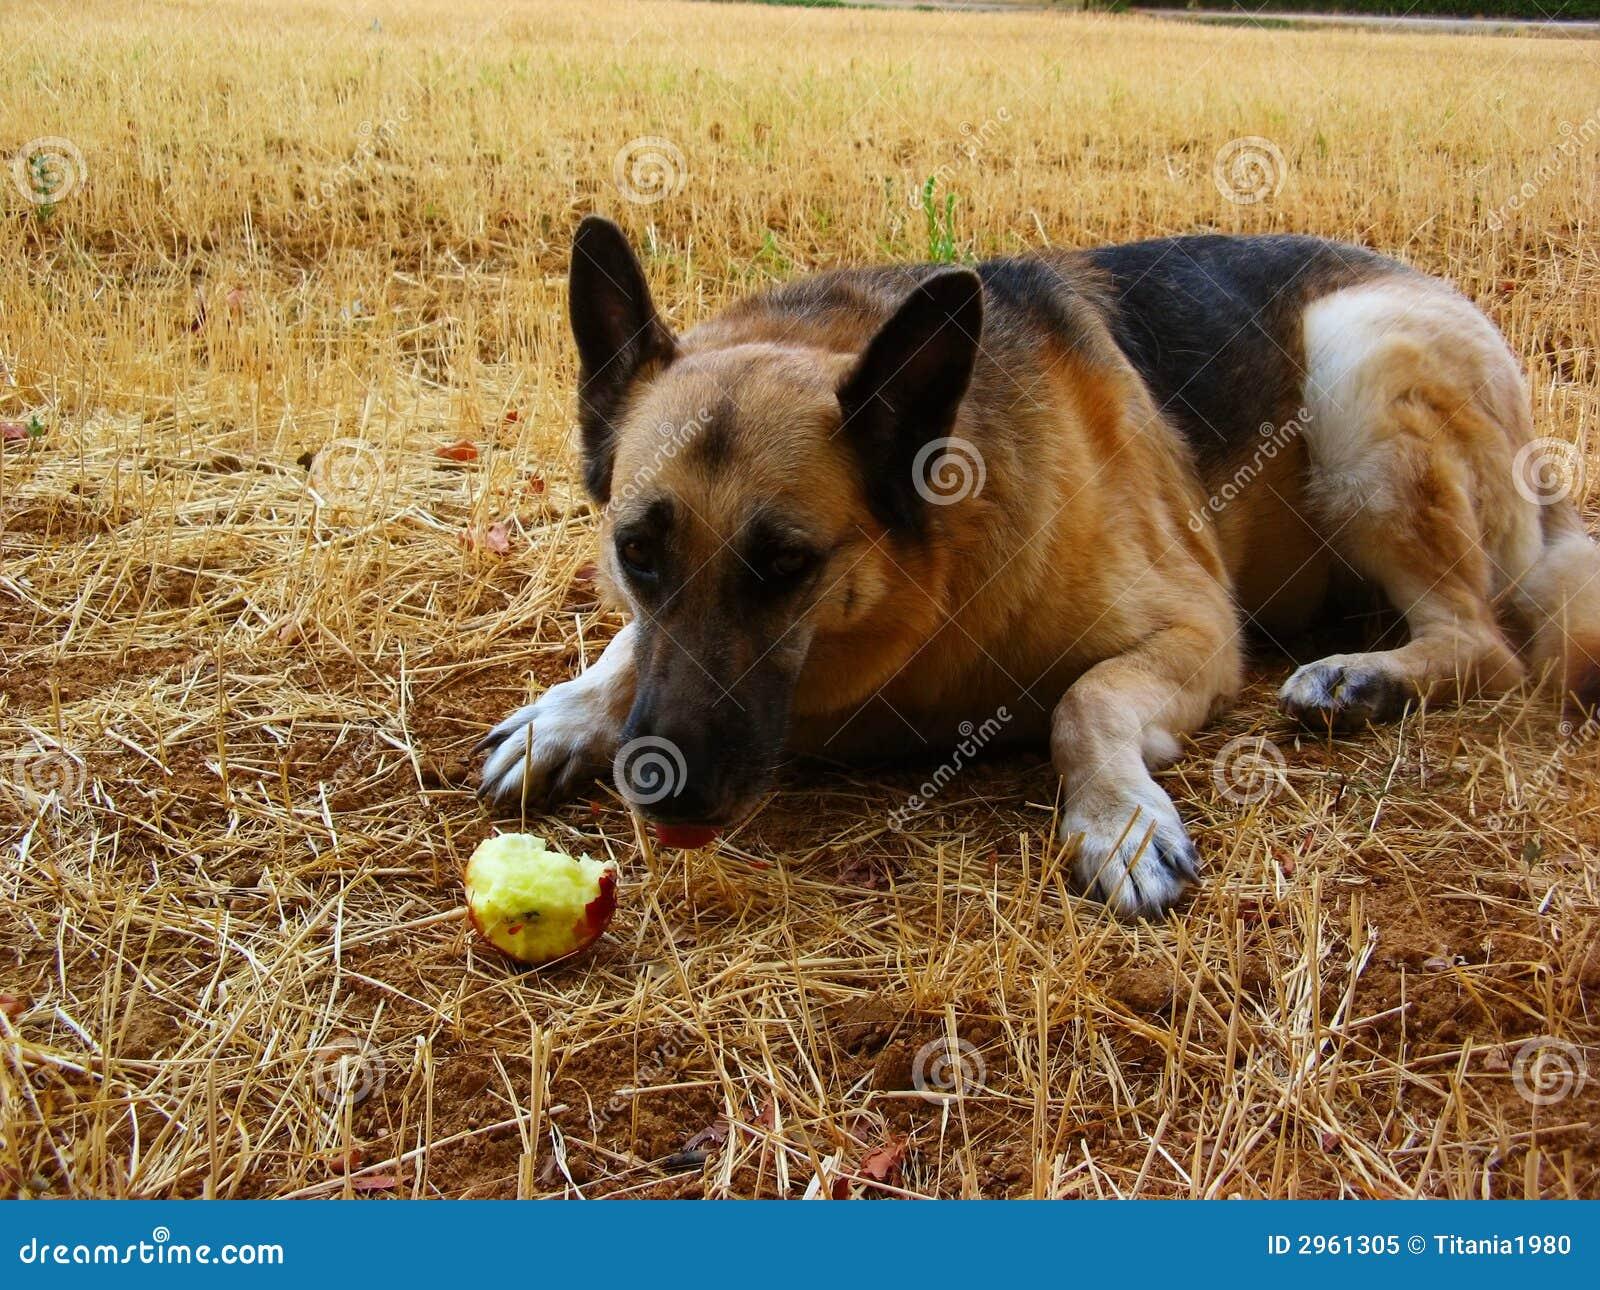 German Shepherd Eating An Apple Royalty Free Stock Photo